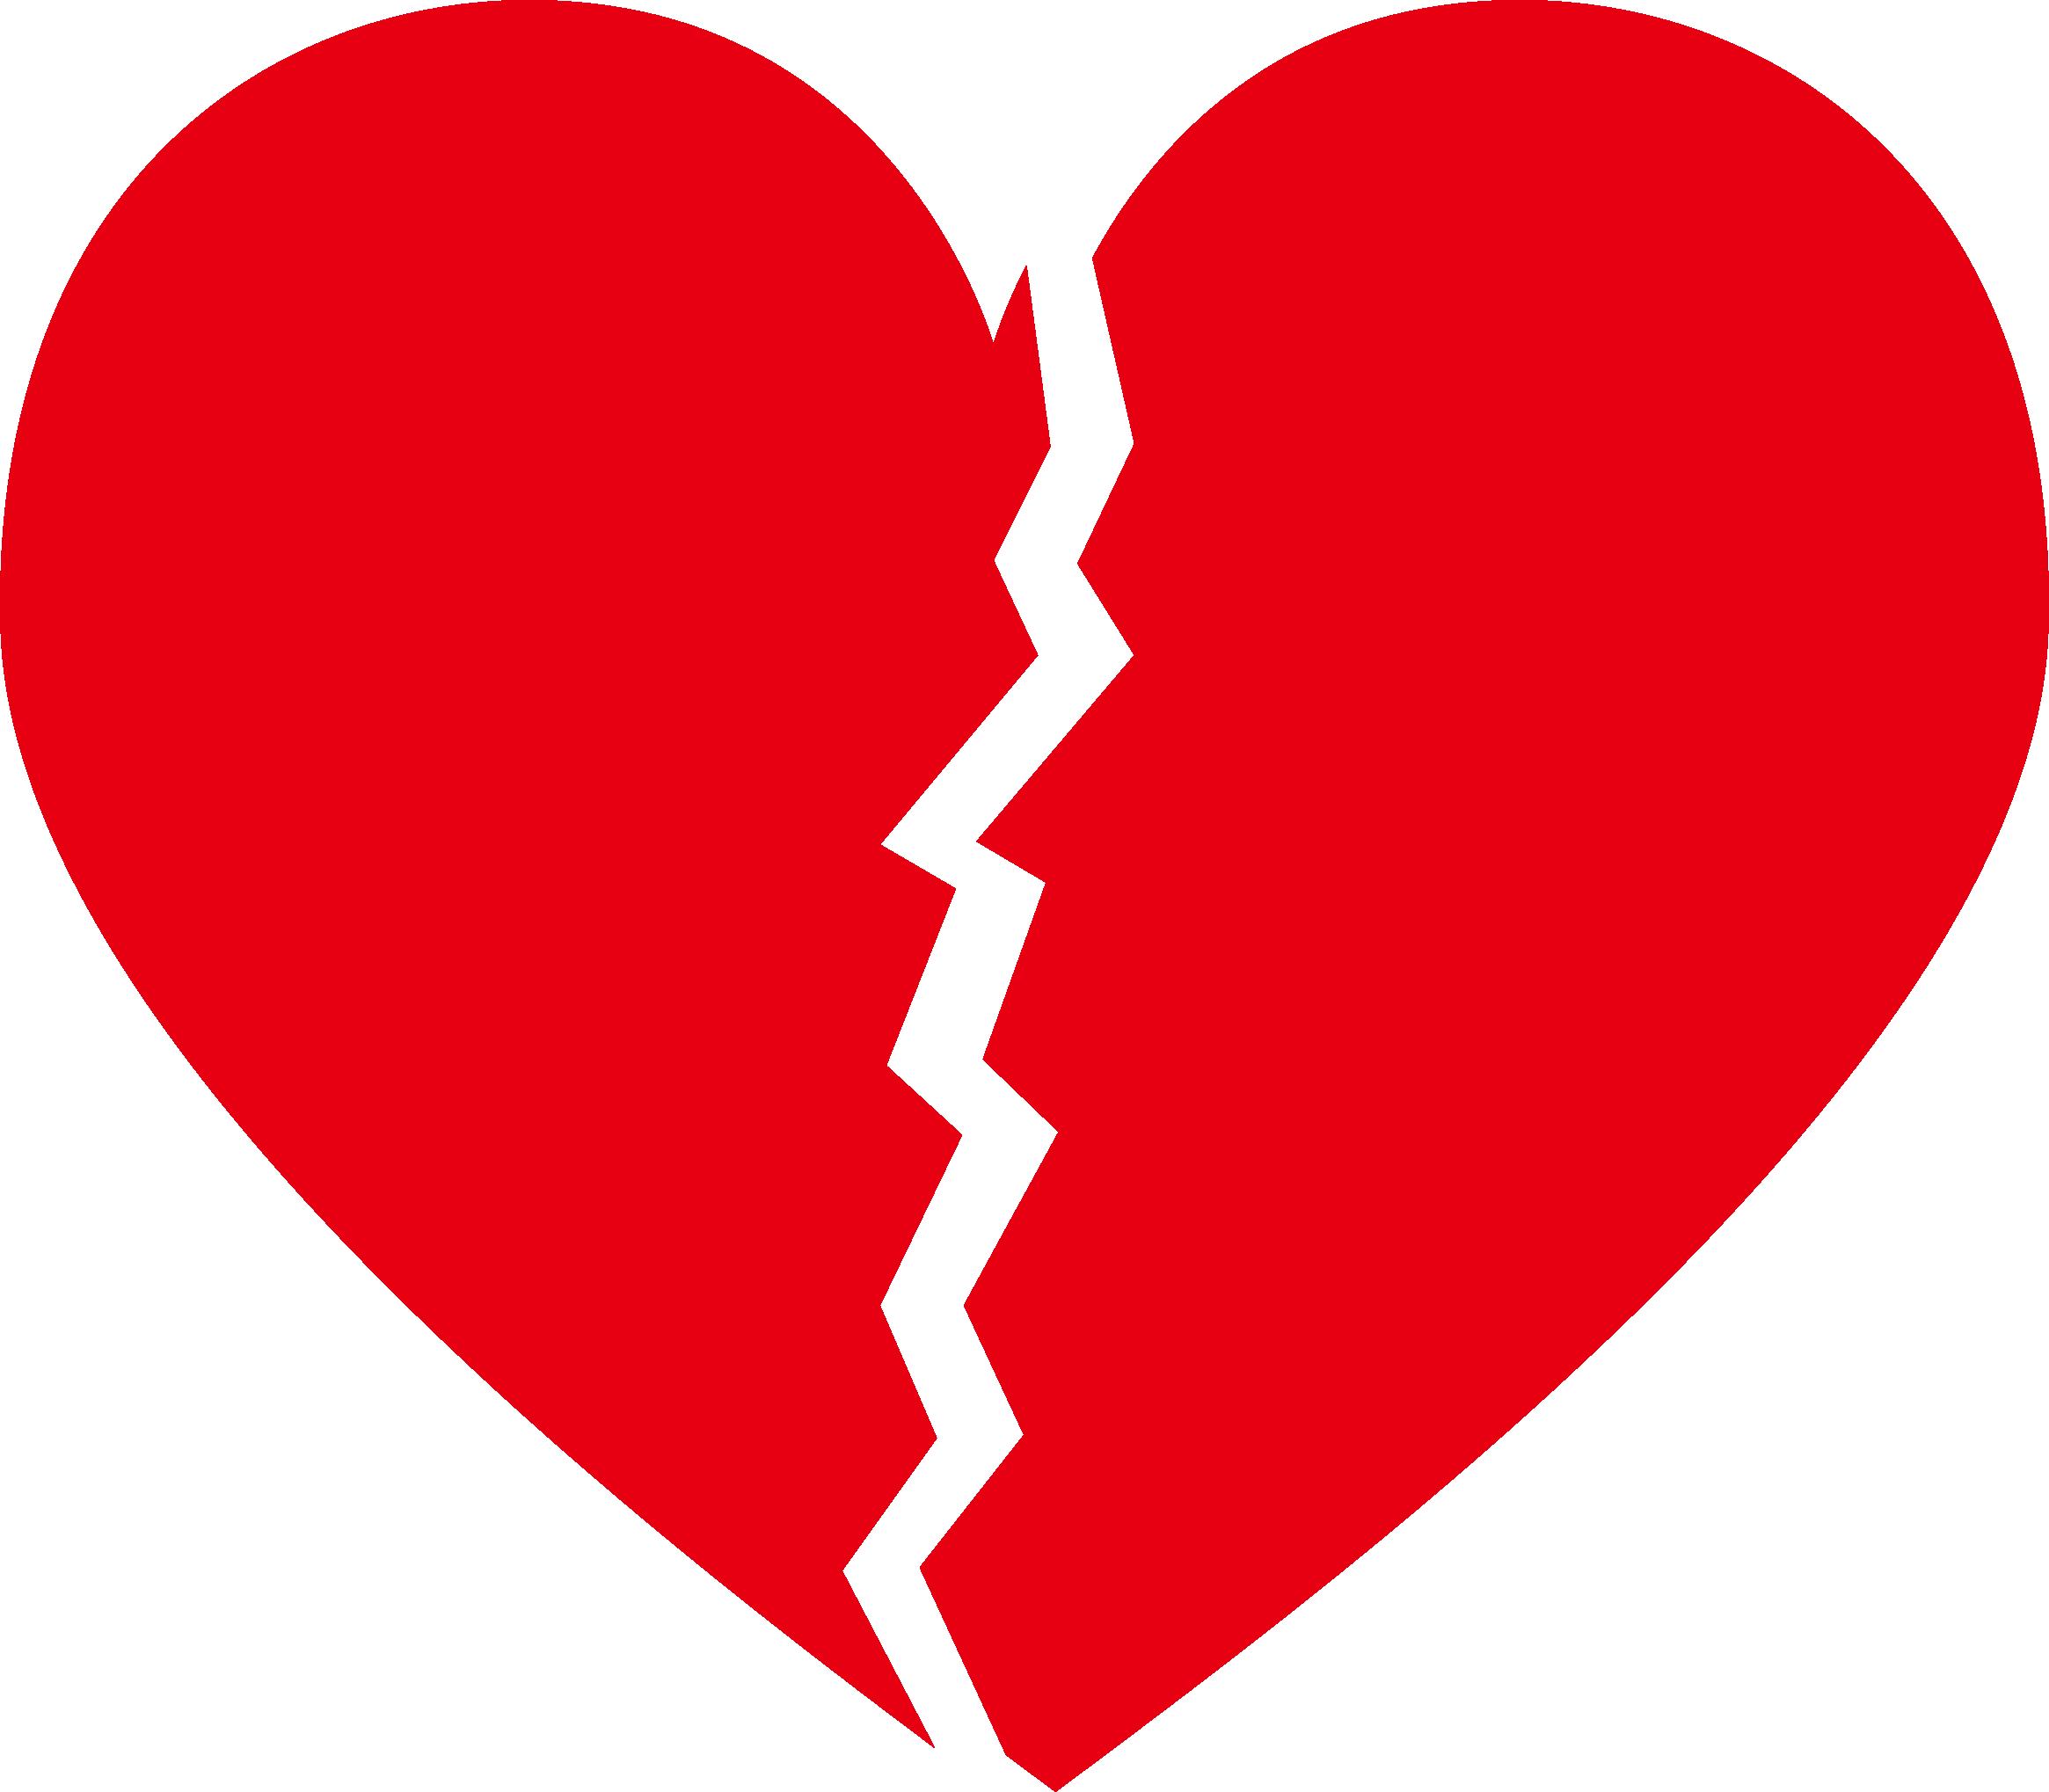 banner transparent Valentine drawing broken heart. Euclidean vector transprent png